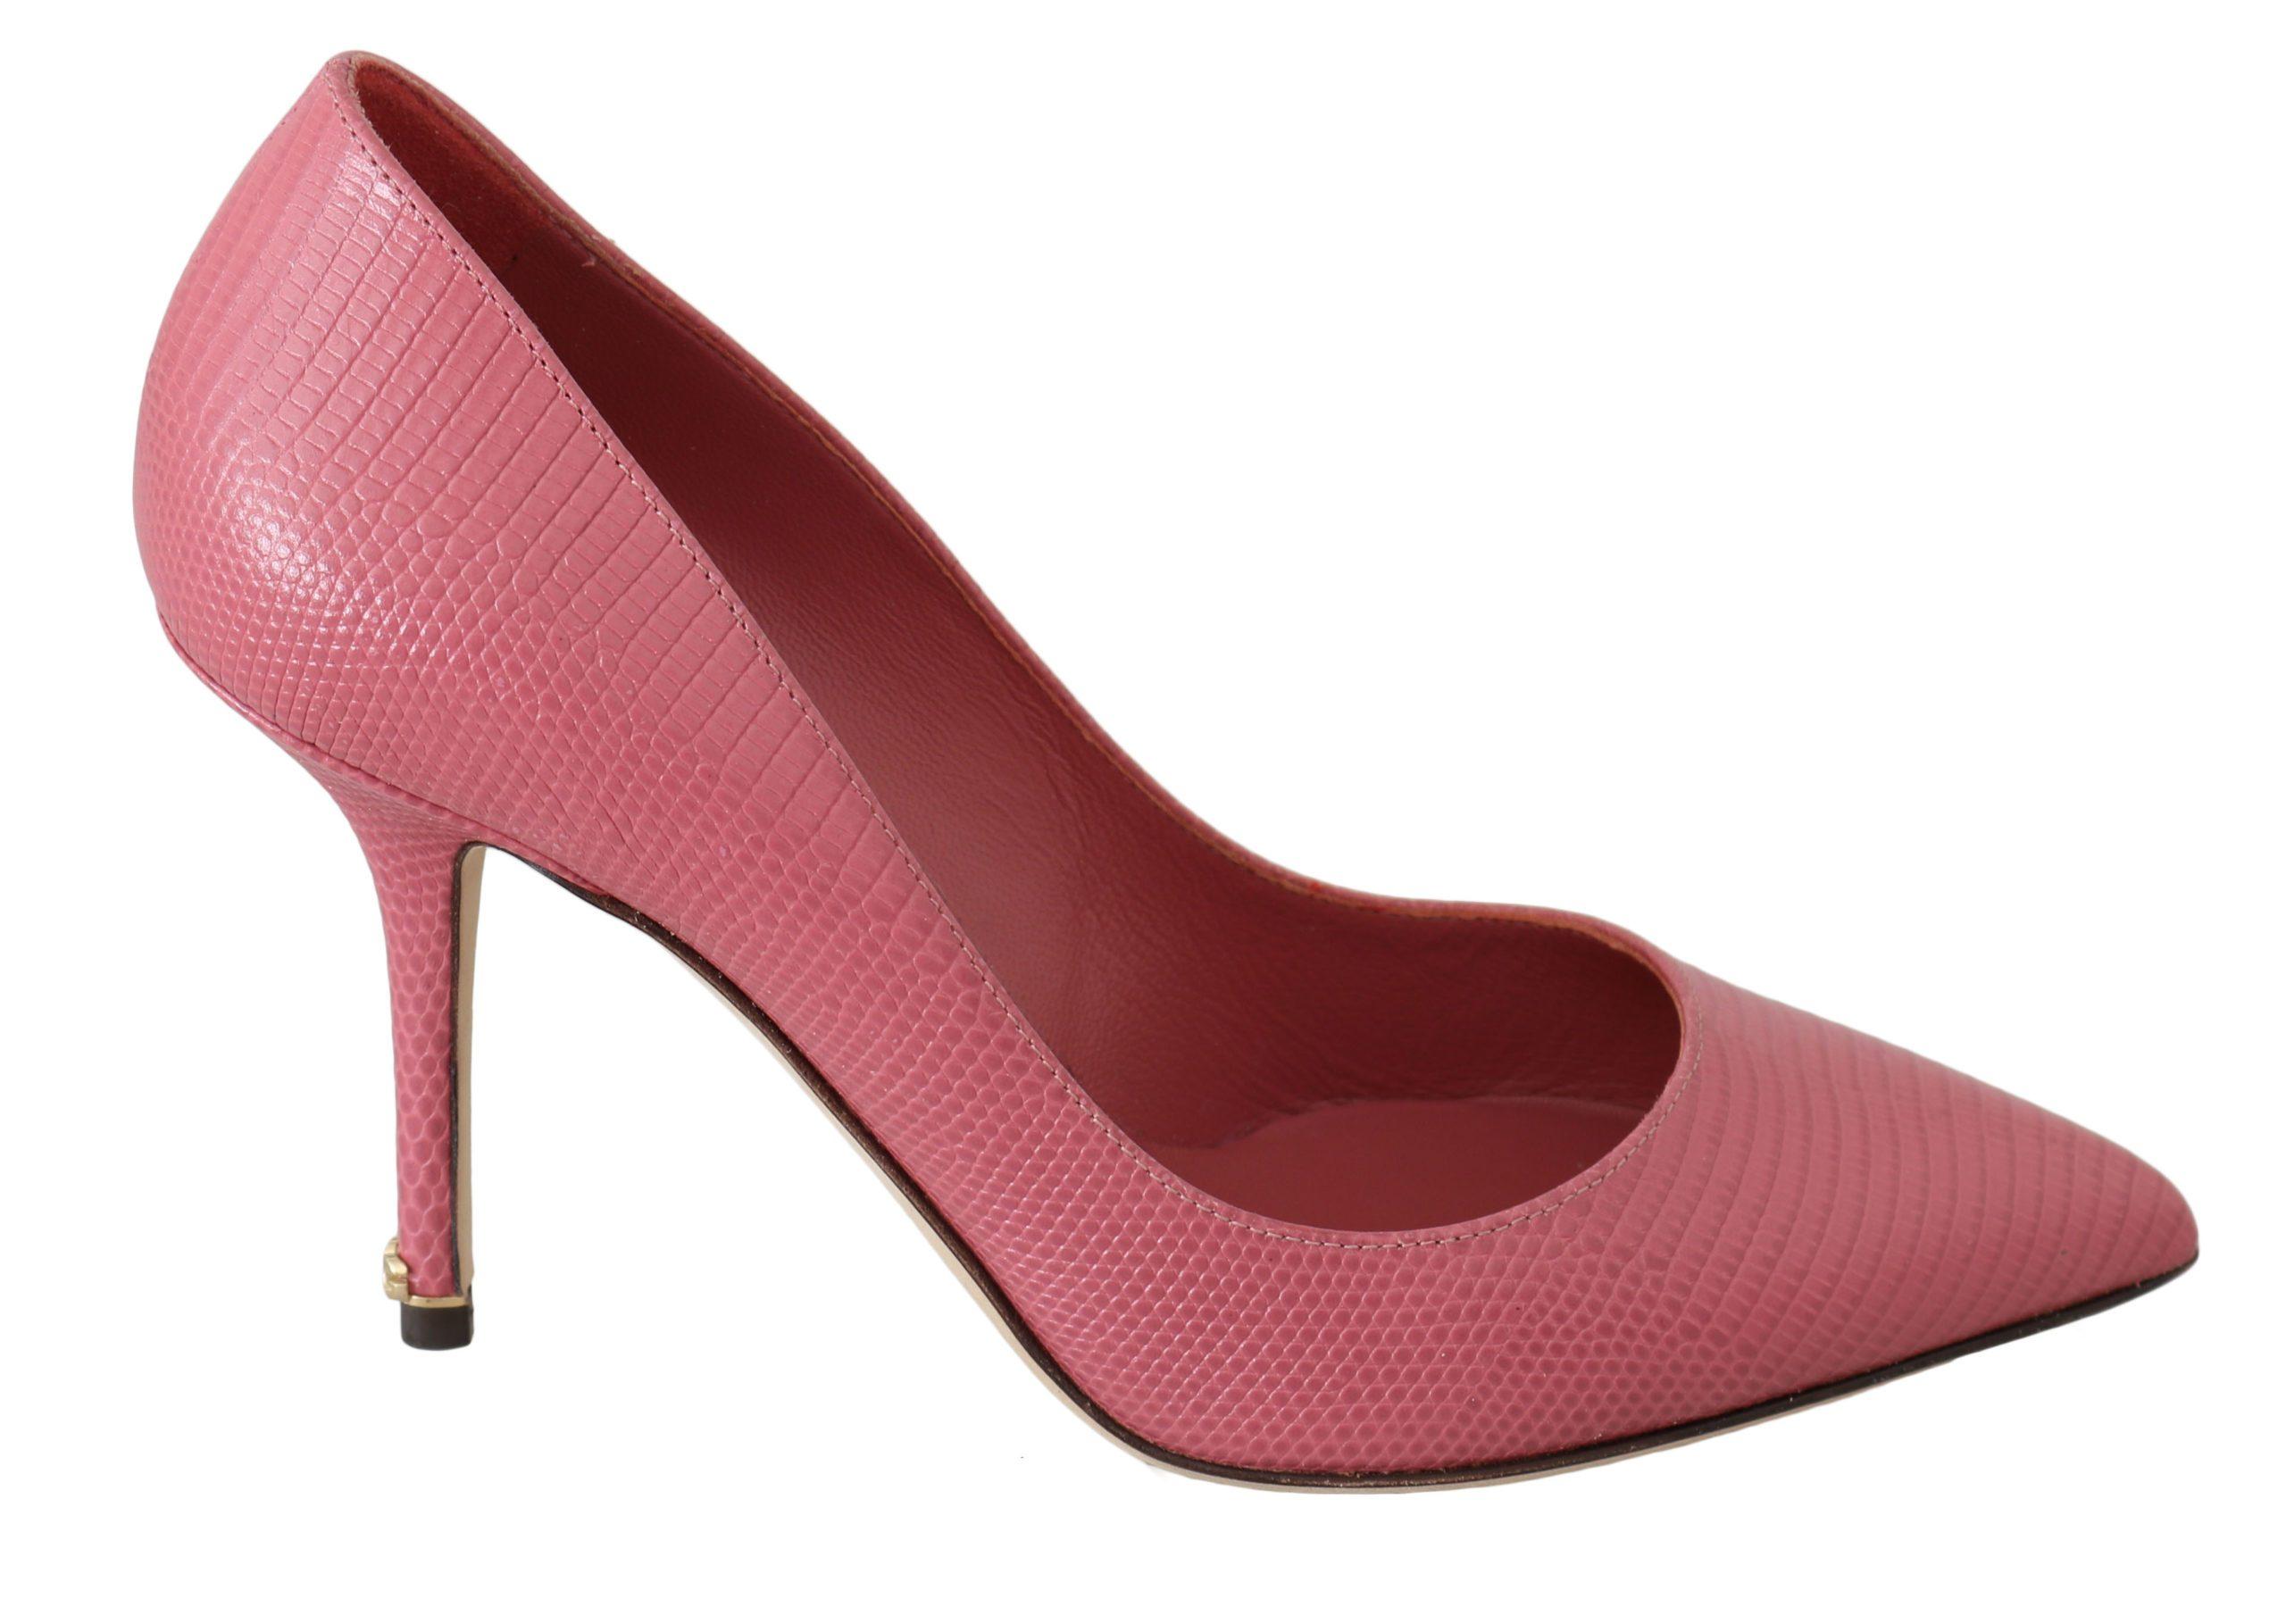 Dolce & Gabbana Women's Leather Bellucci Pumps Pink LA6289 - EU36/US5.5